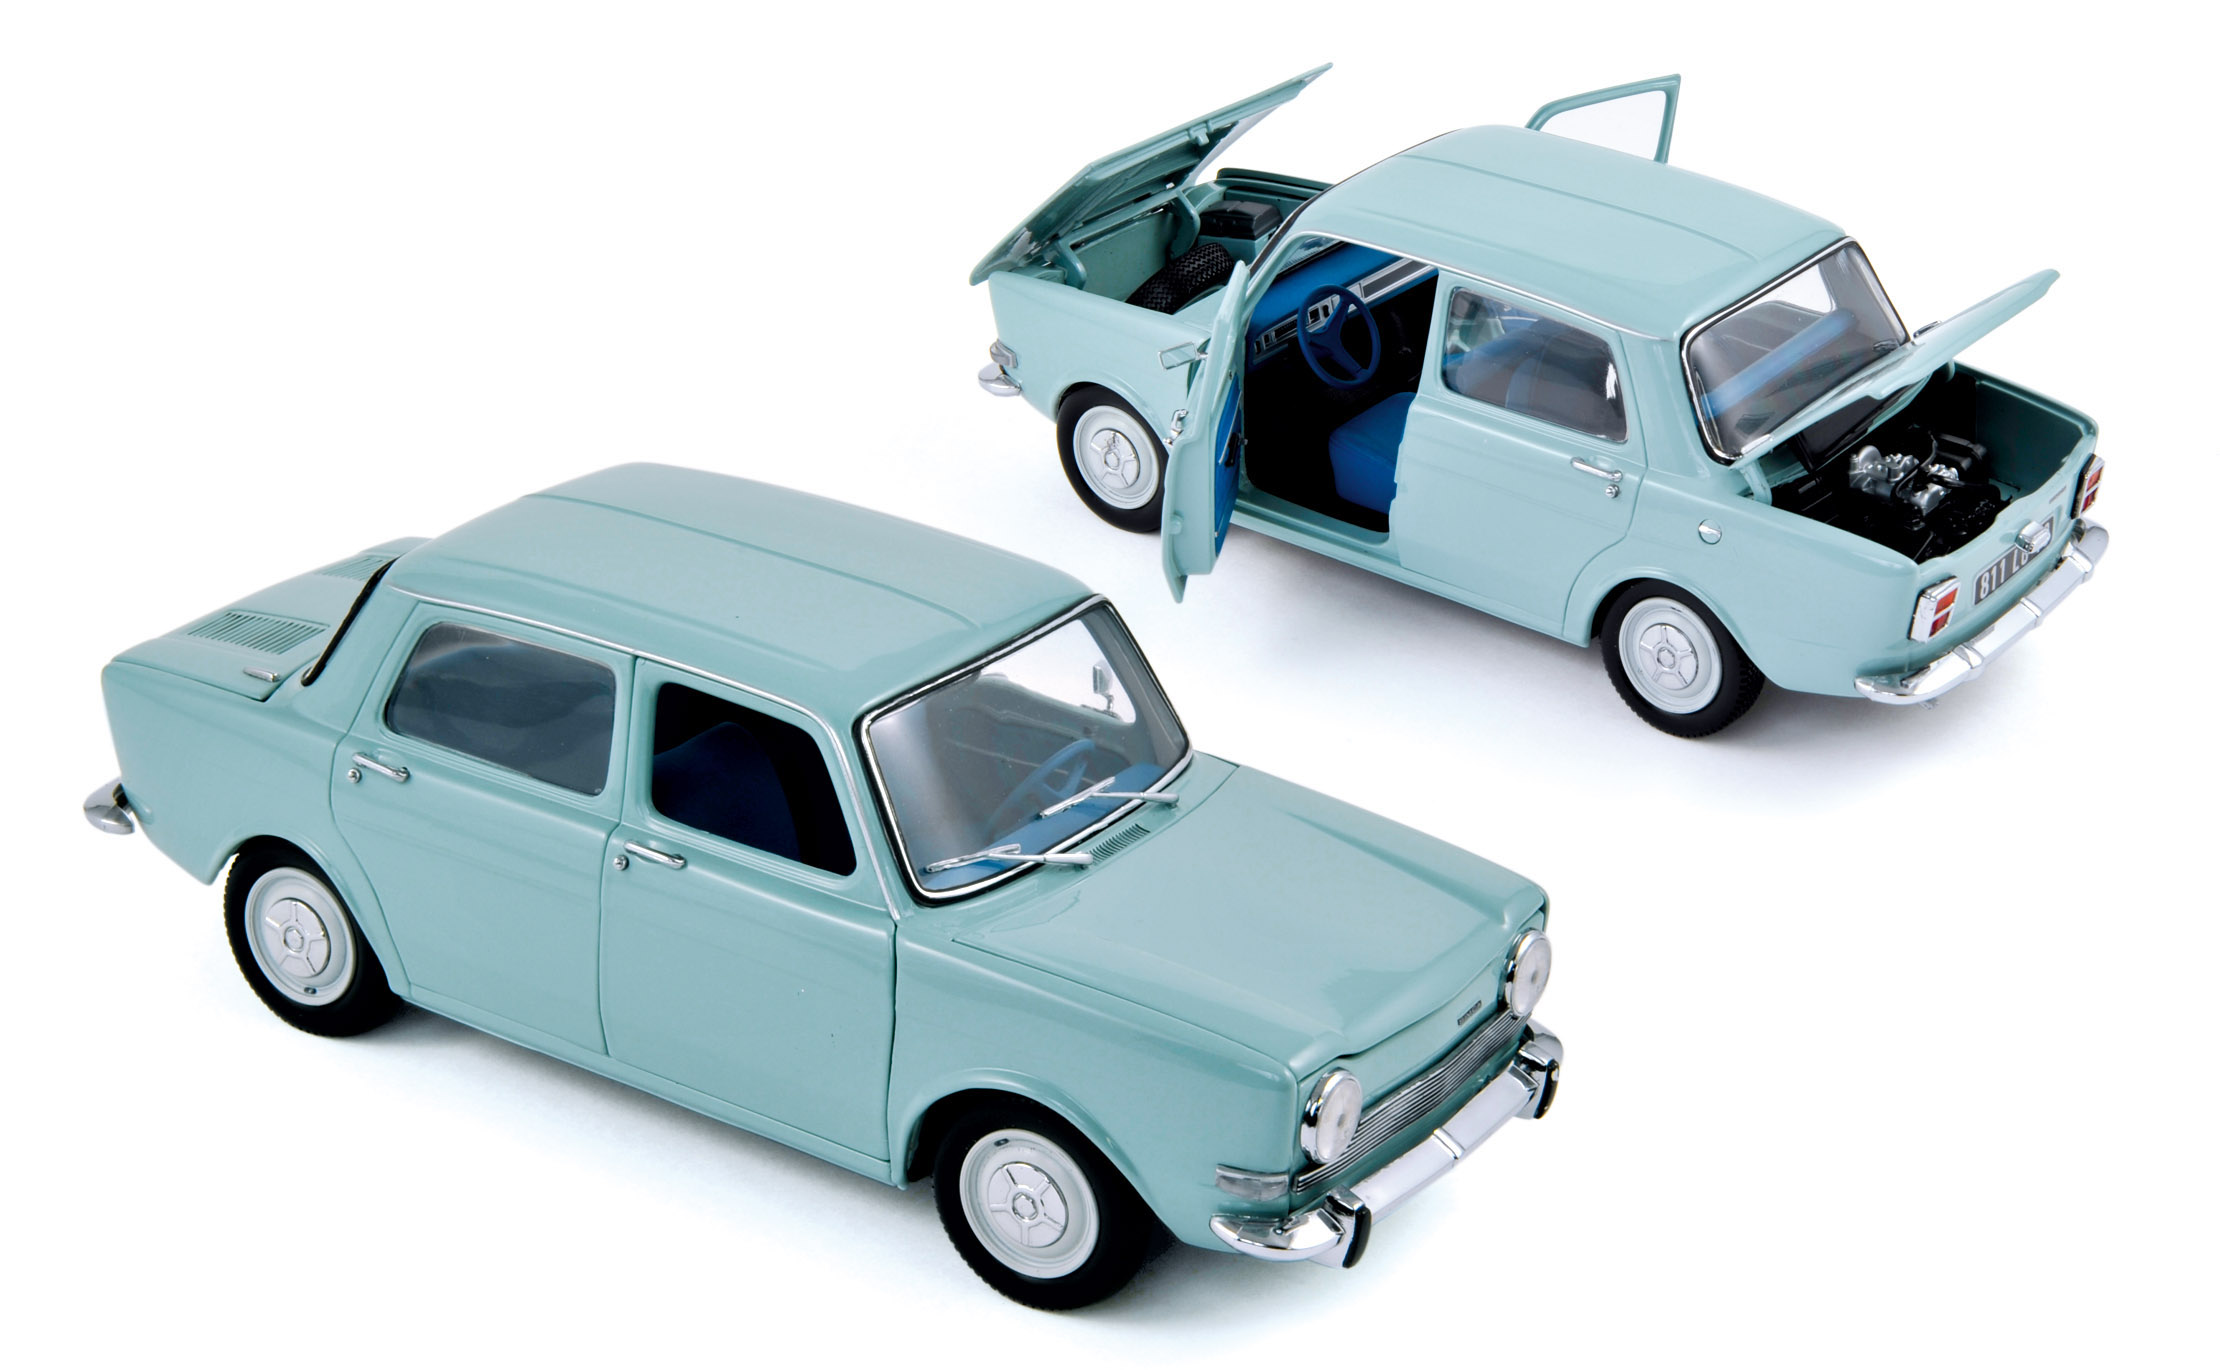 simca 1000 ls 1974 artic blue 1 18 norev 185712. Black Bedroom Furniture Sets. Home Design Ideas